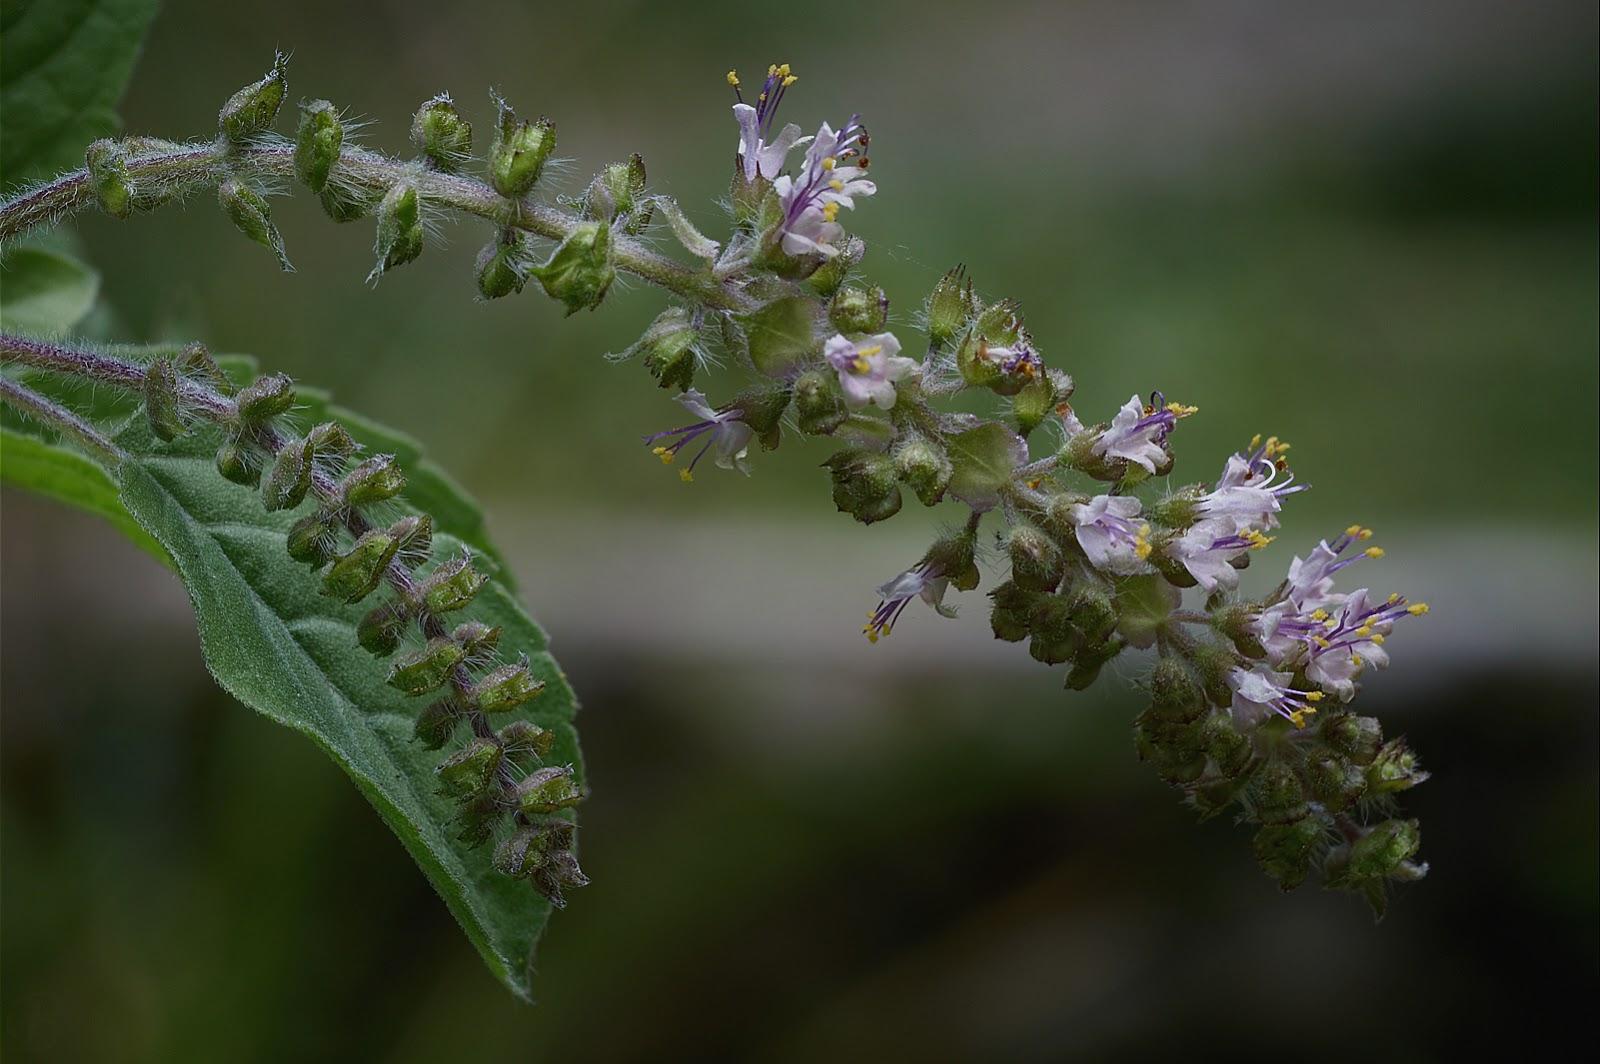 macro photography, soft, subtle, garden, flowers, Philippines